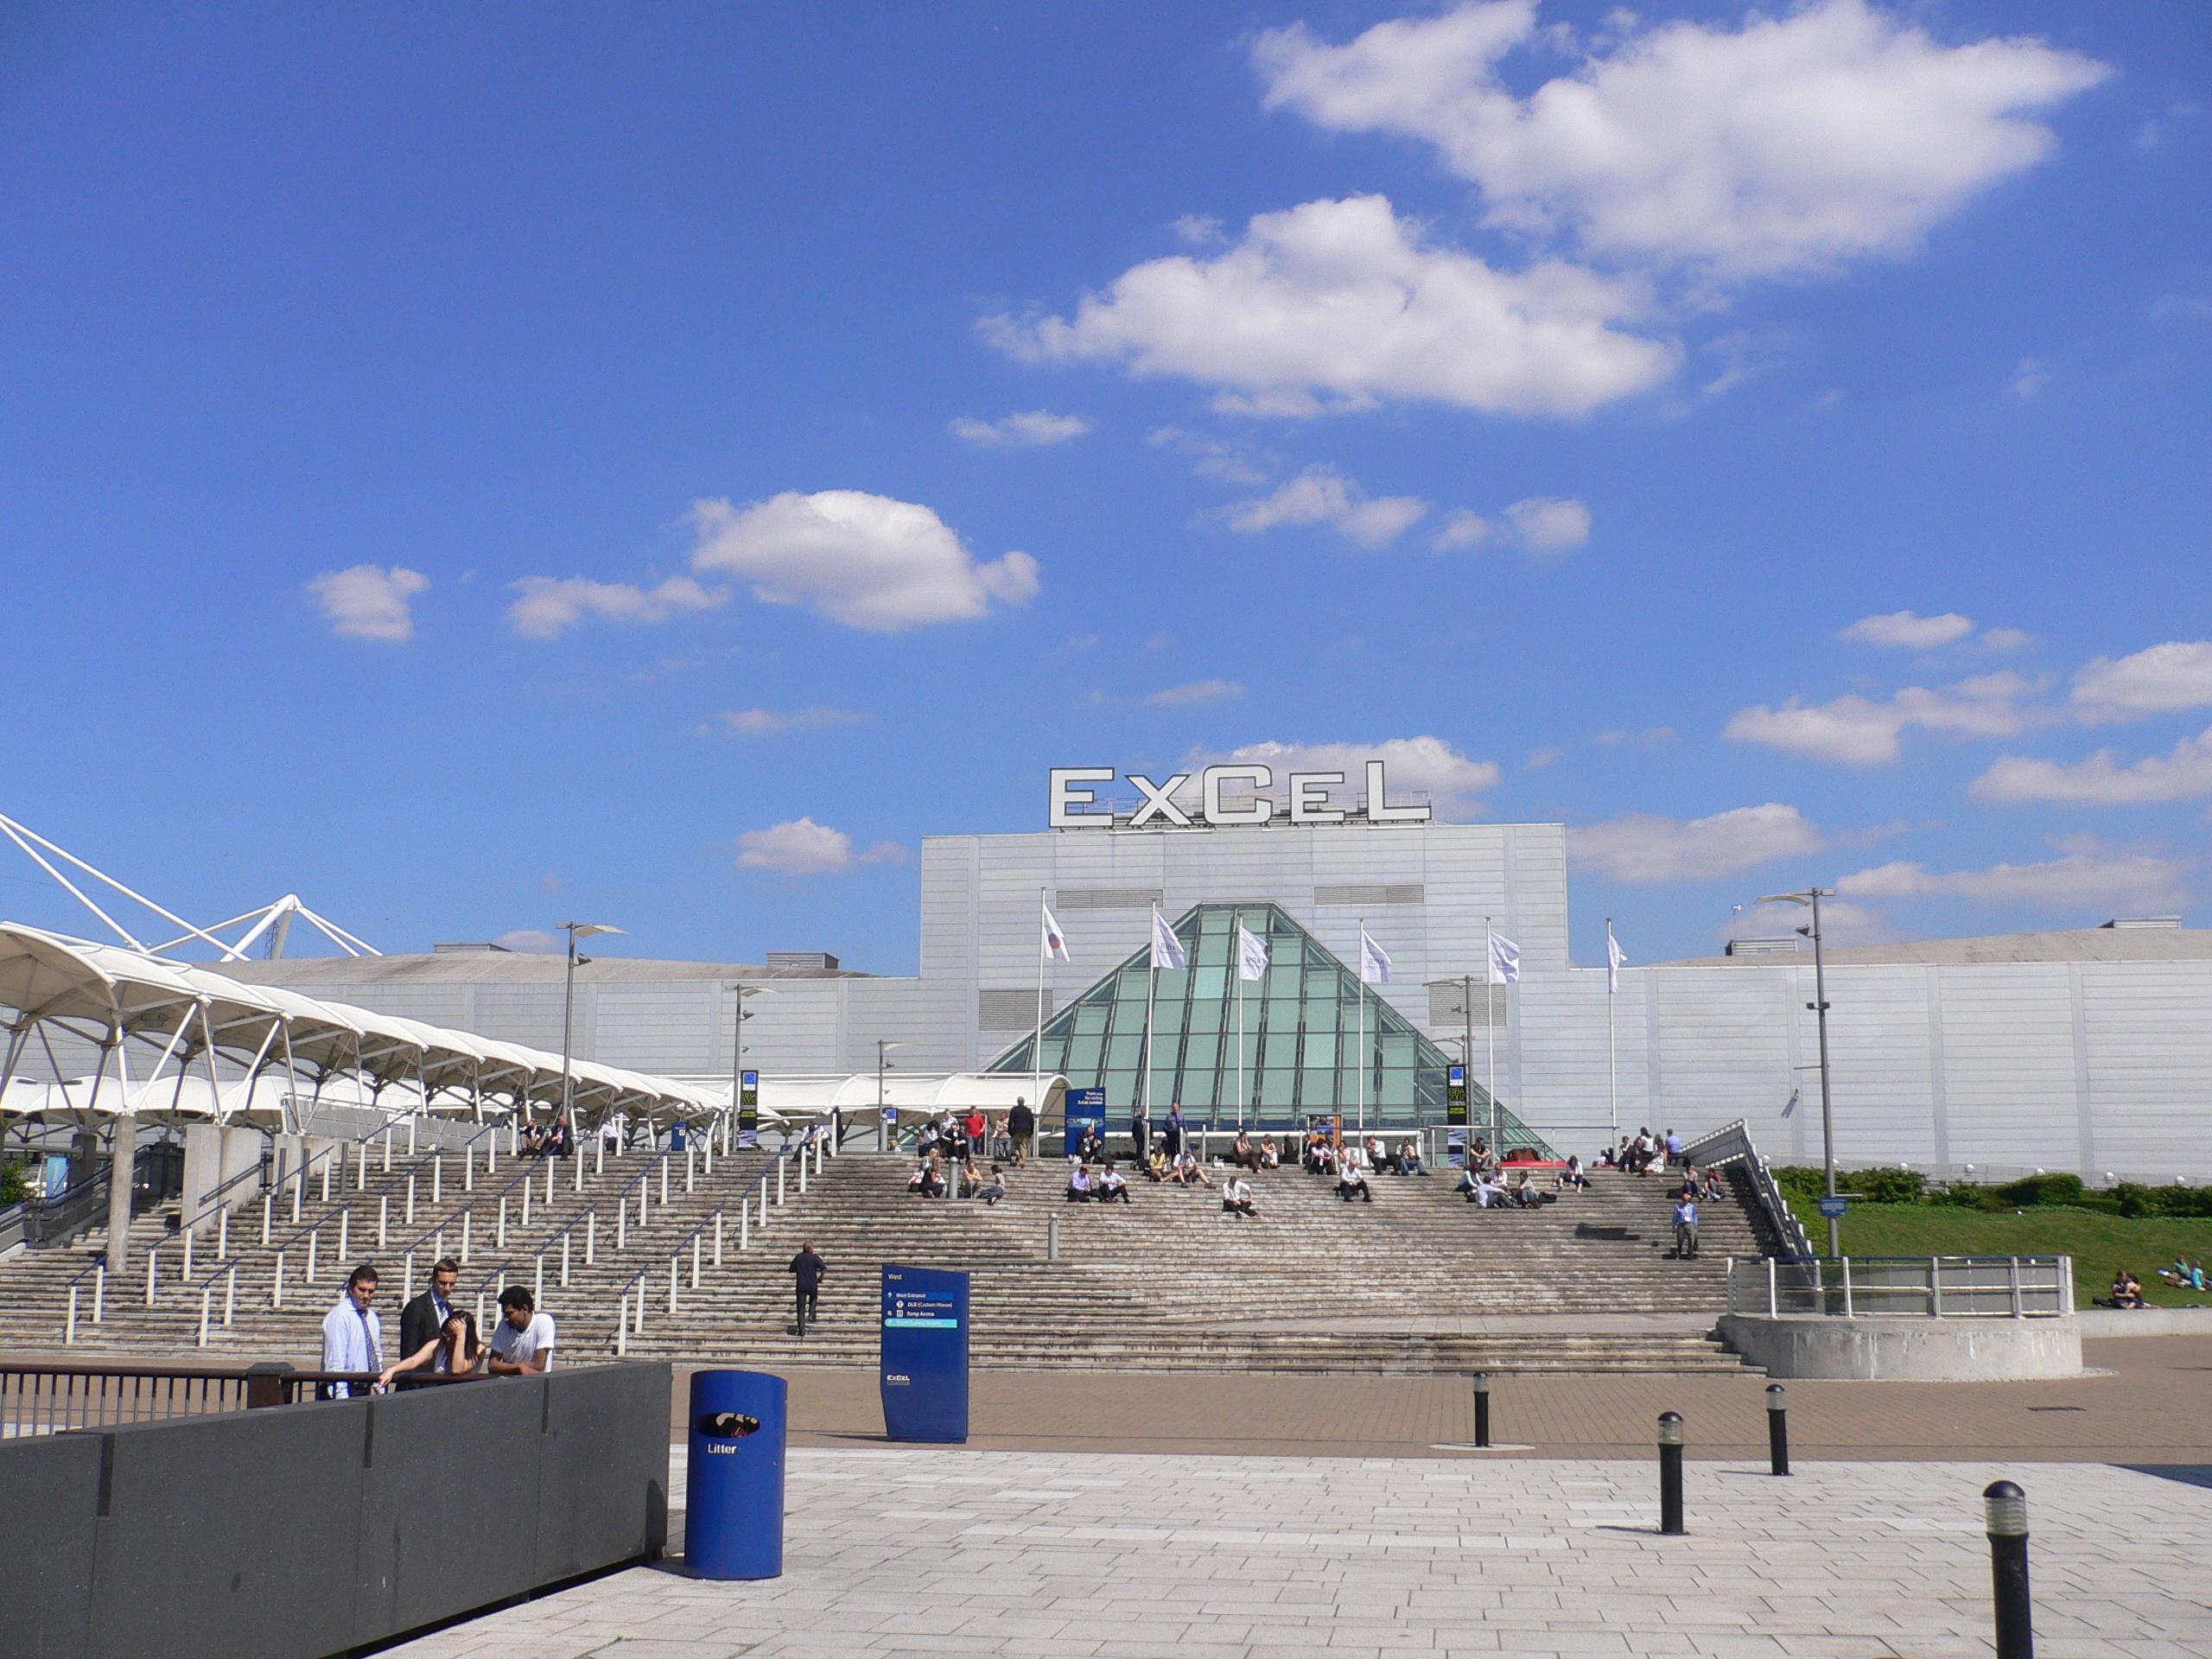 File:ExCeL London.jpg - Wikimedia Commons